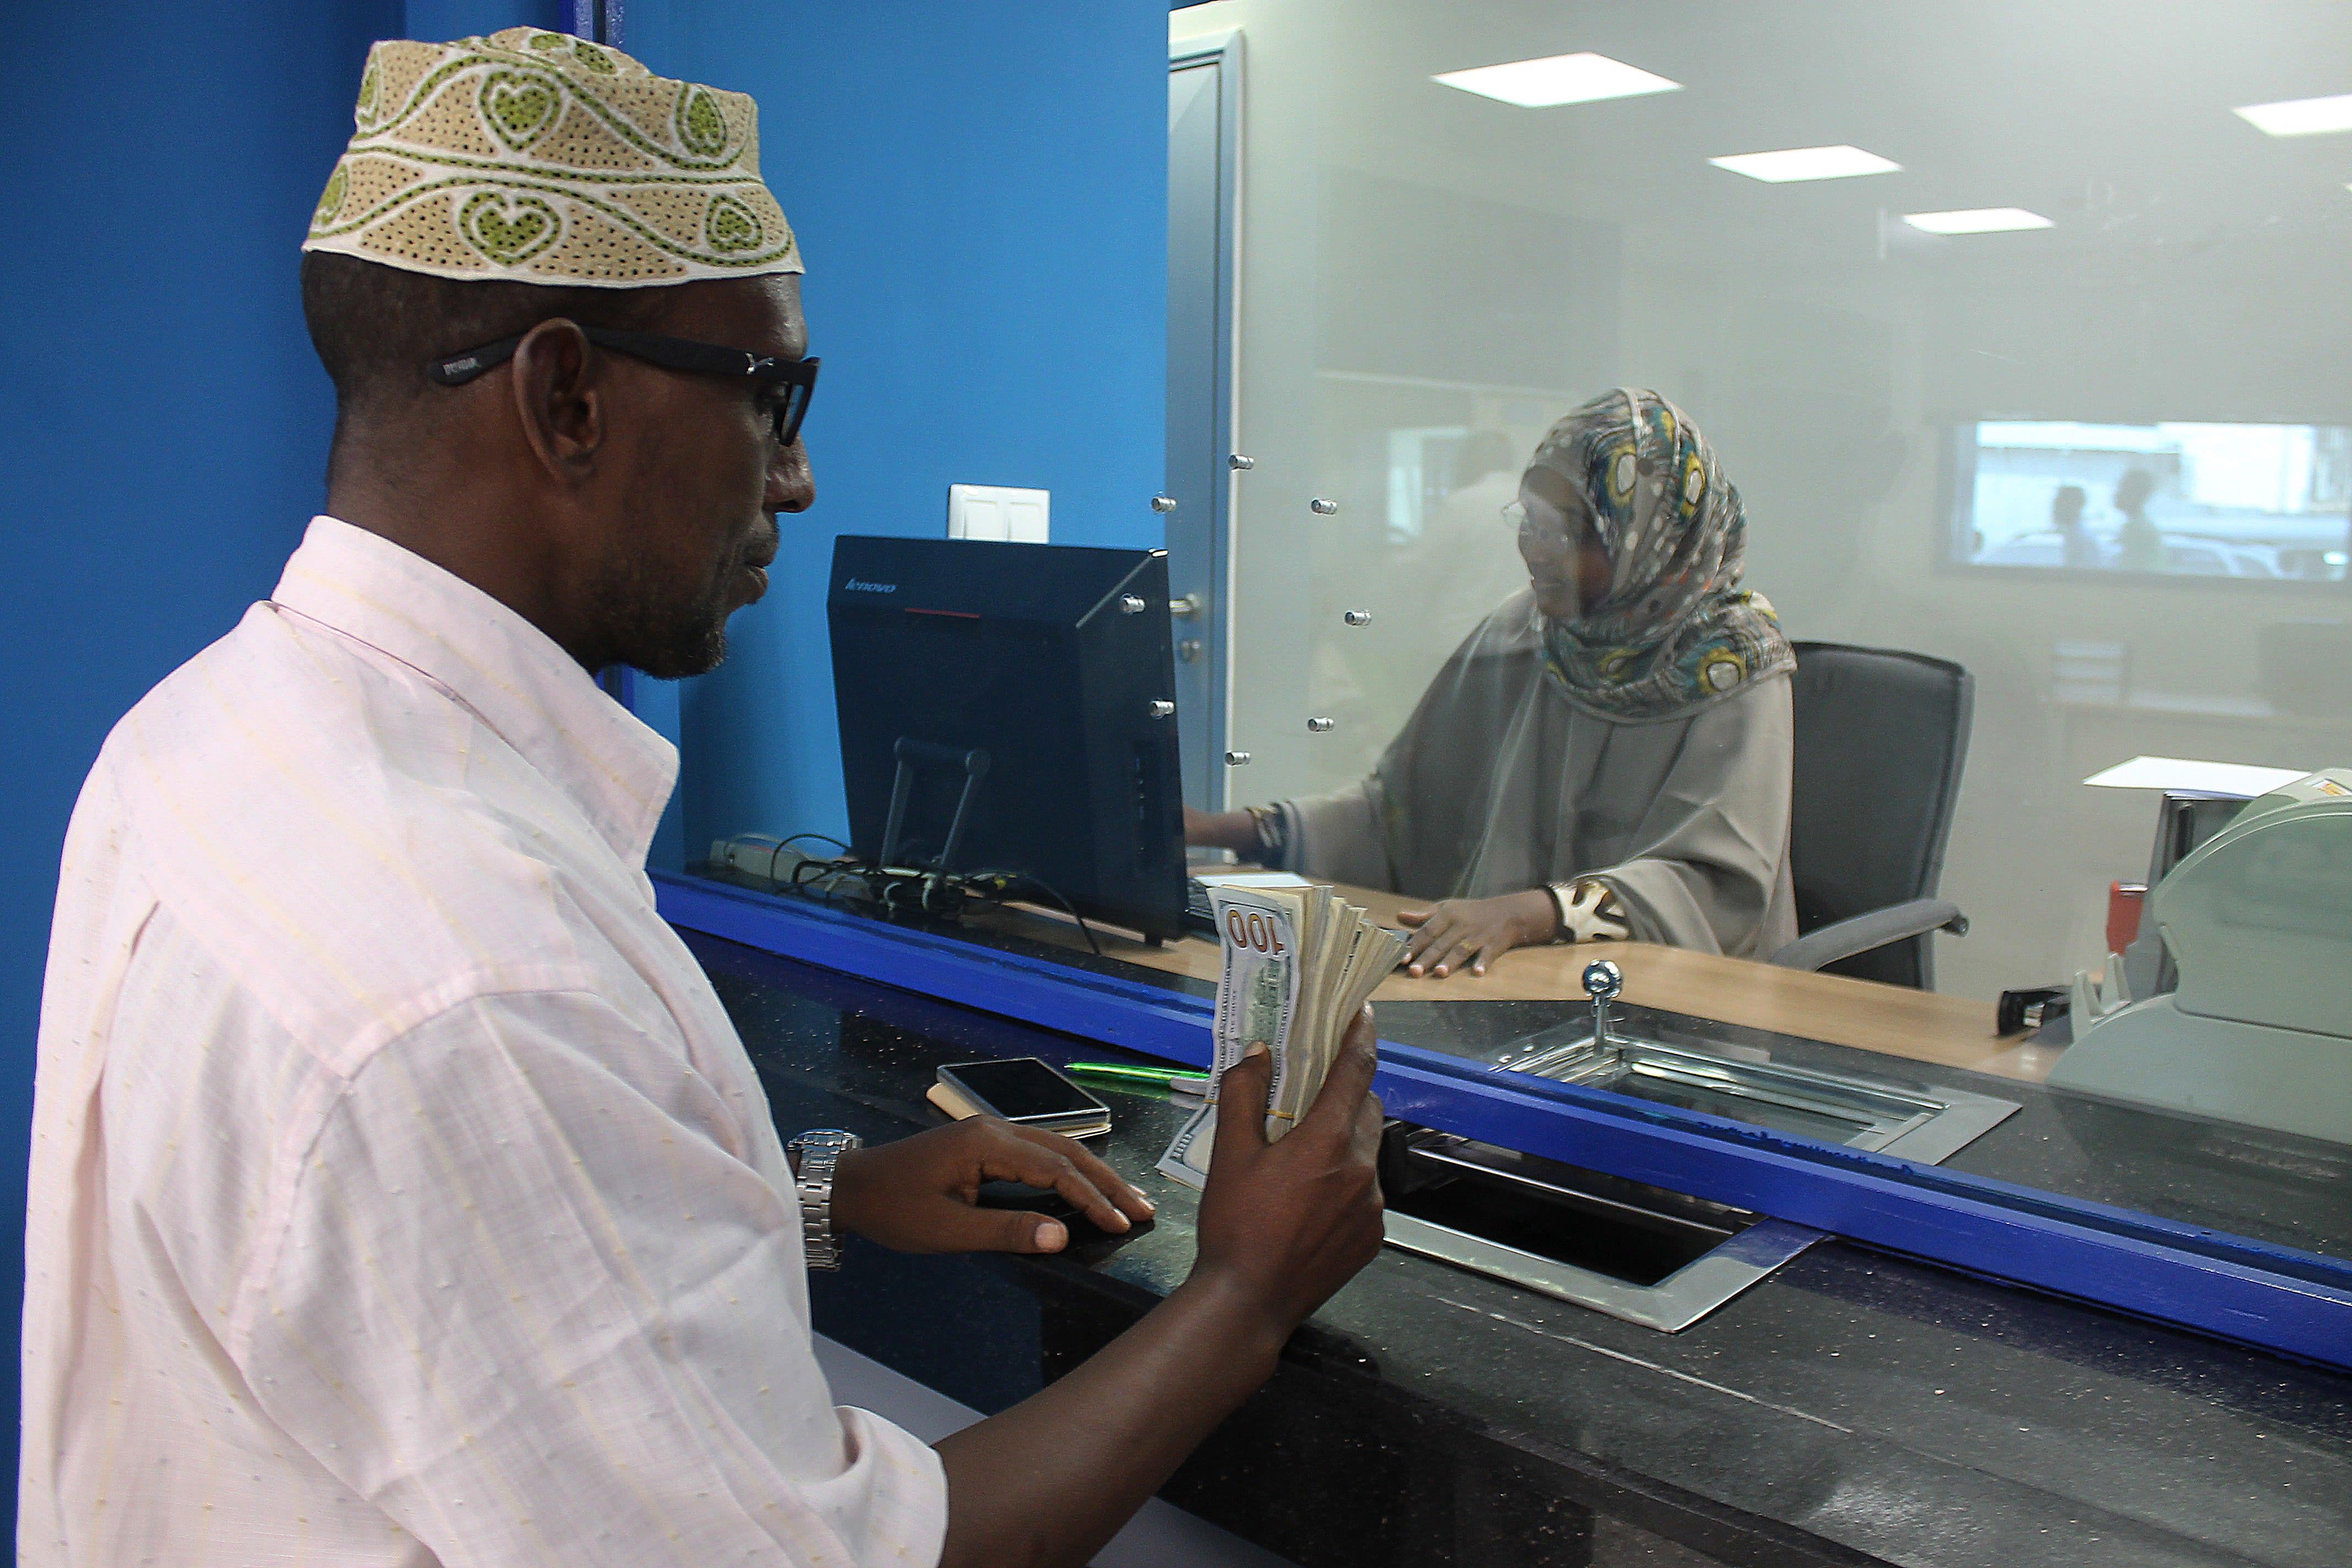 A customer at a bank in Mogadishu, Somalia on June 7, 2015.